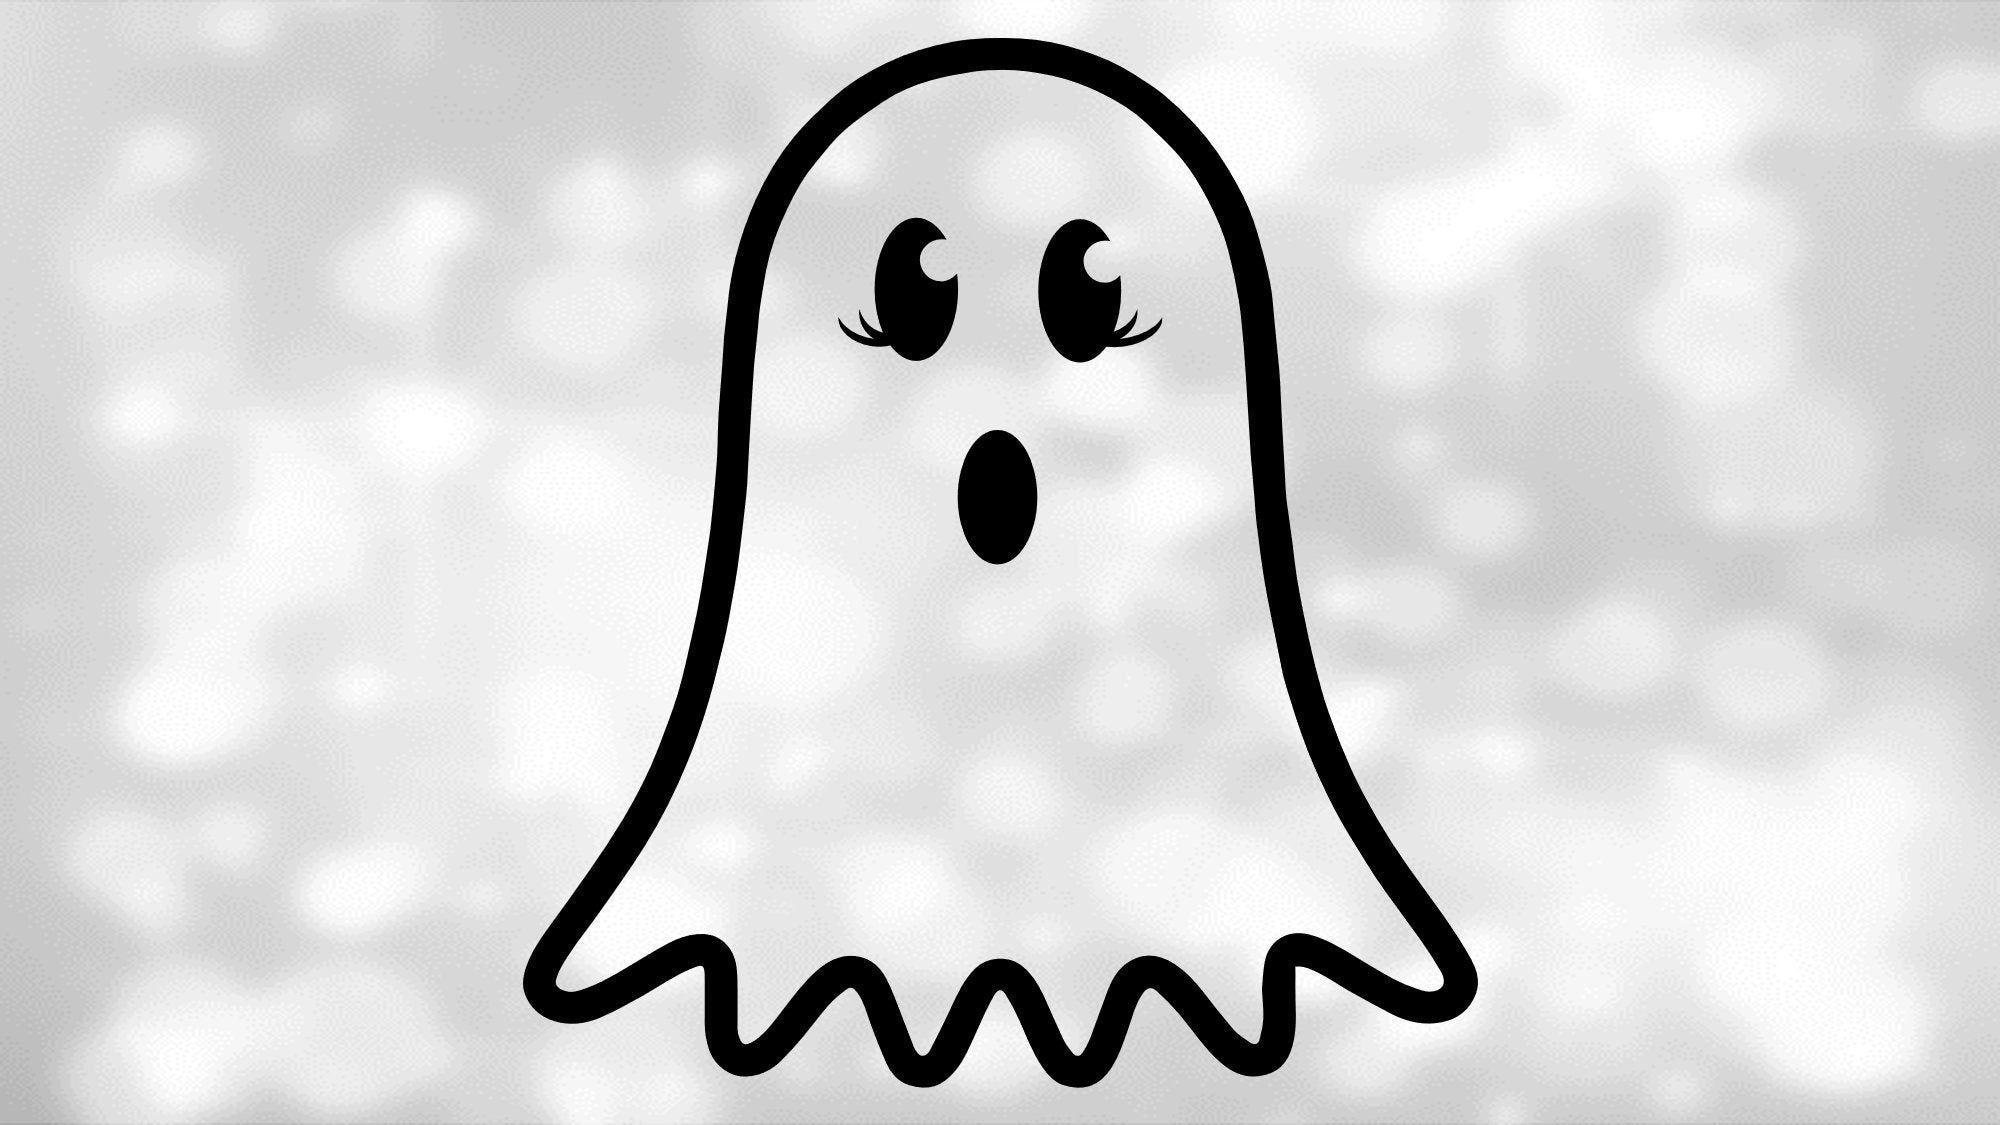 Halloween Clip Art Simple Black White Cute Ghost W Big Etsy Halloween Clips Halloween Clipart Cute Ghost